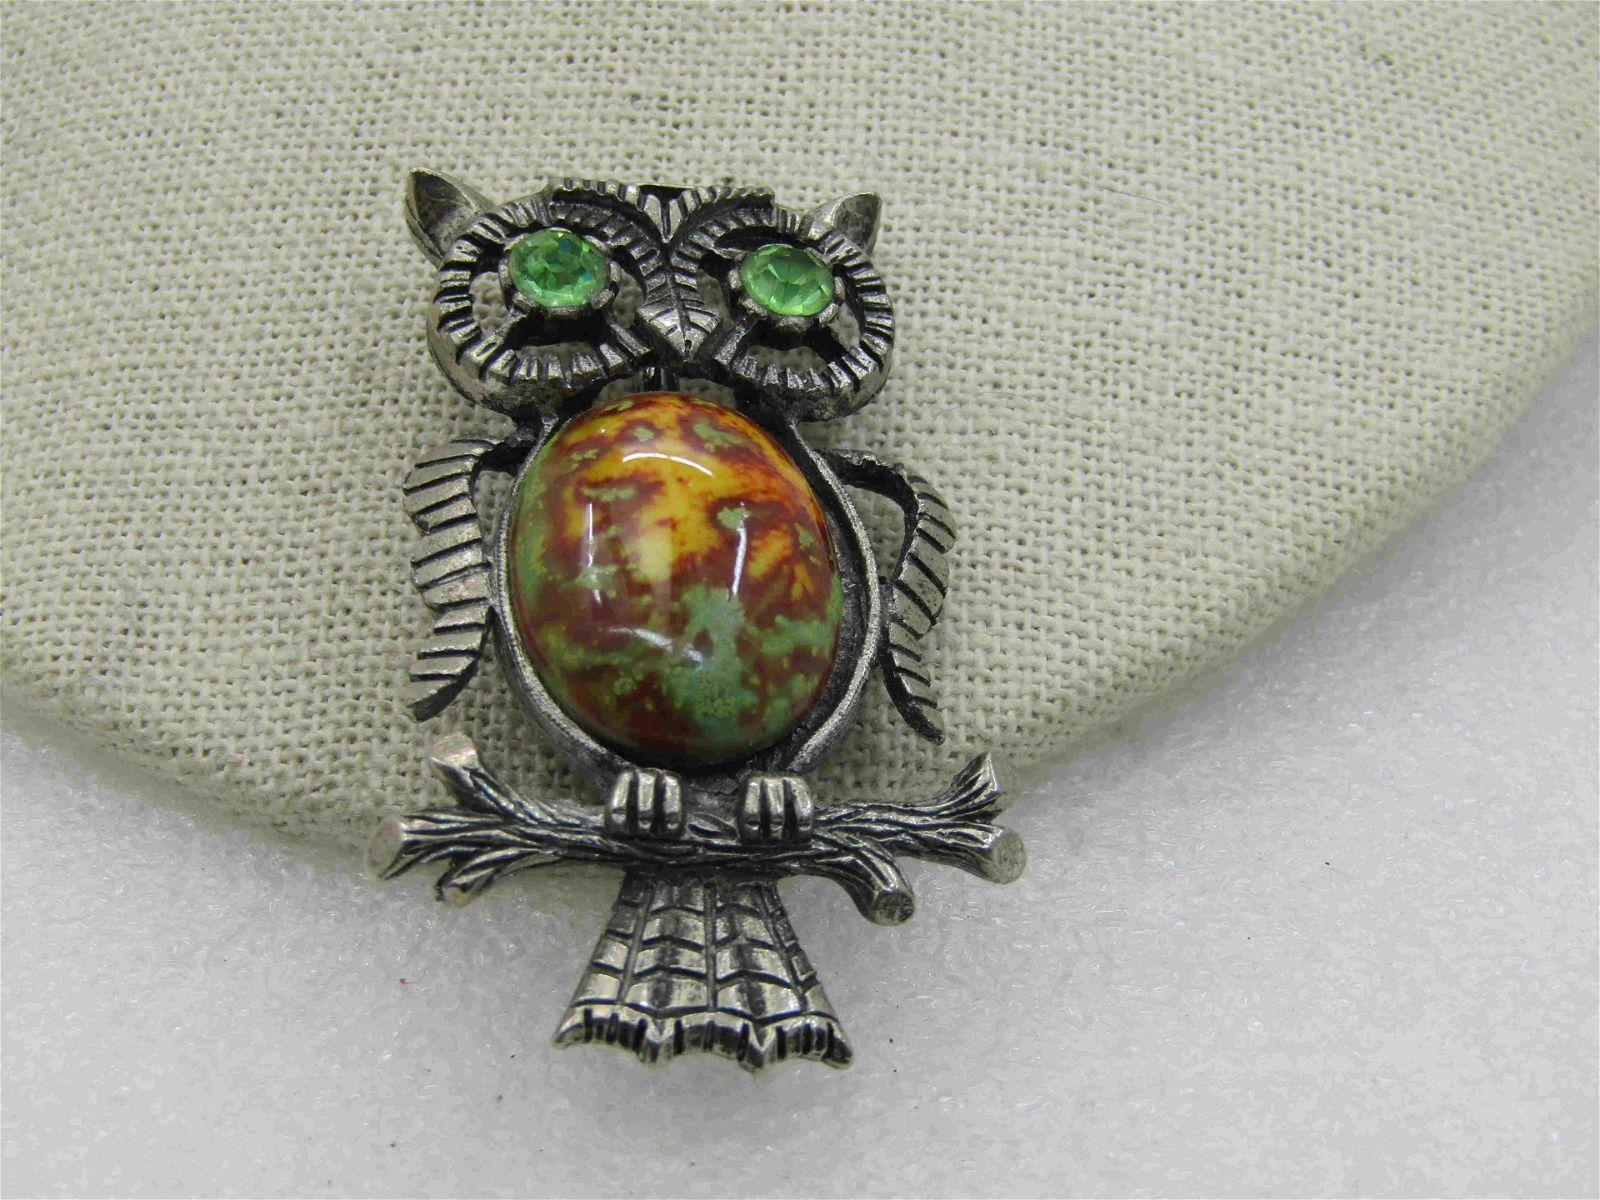 Vintage Rhinestone & Faux Agate Owl Brooch, Pewter